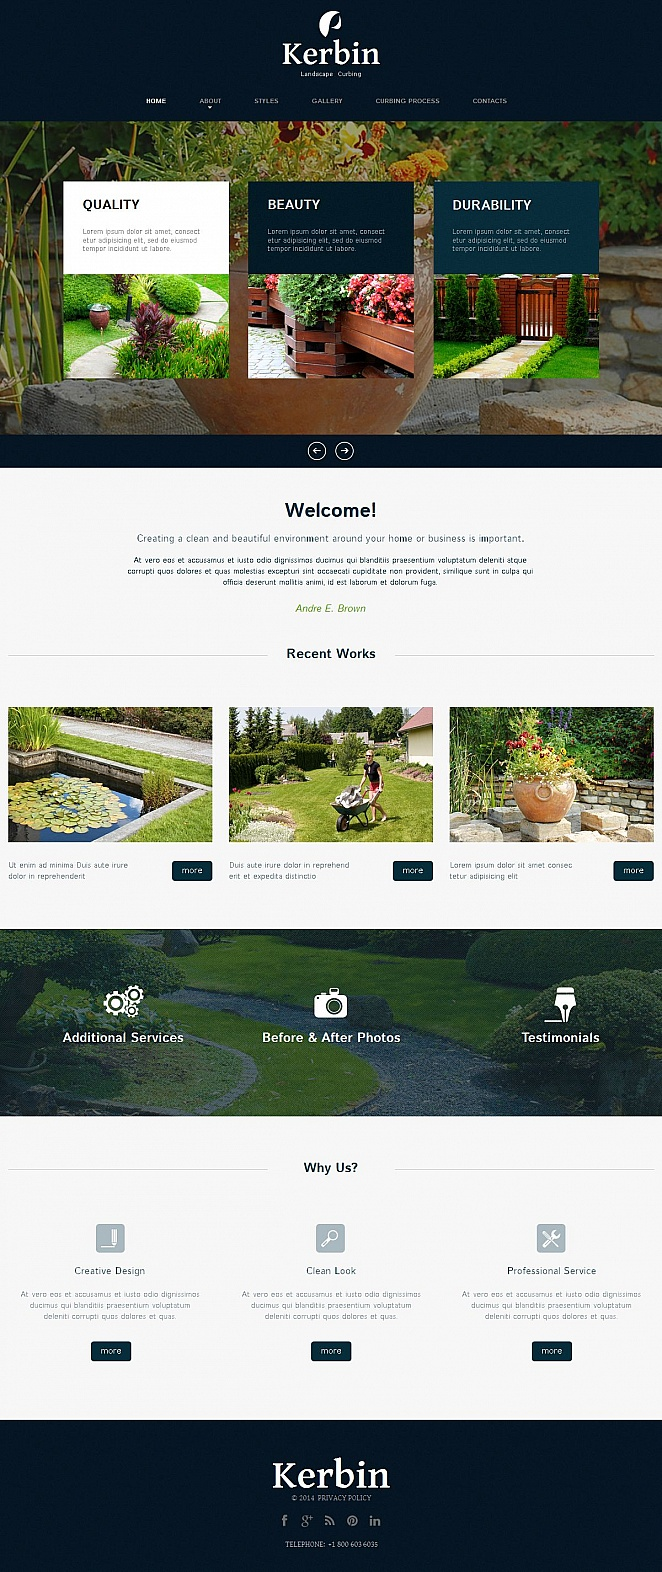 Landscape Curbing Website Template - image